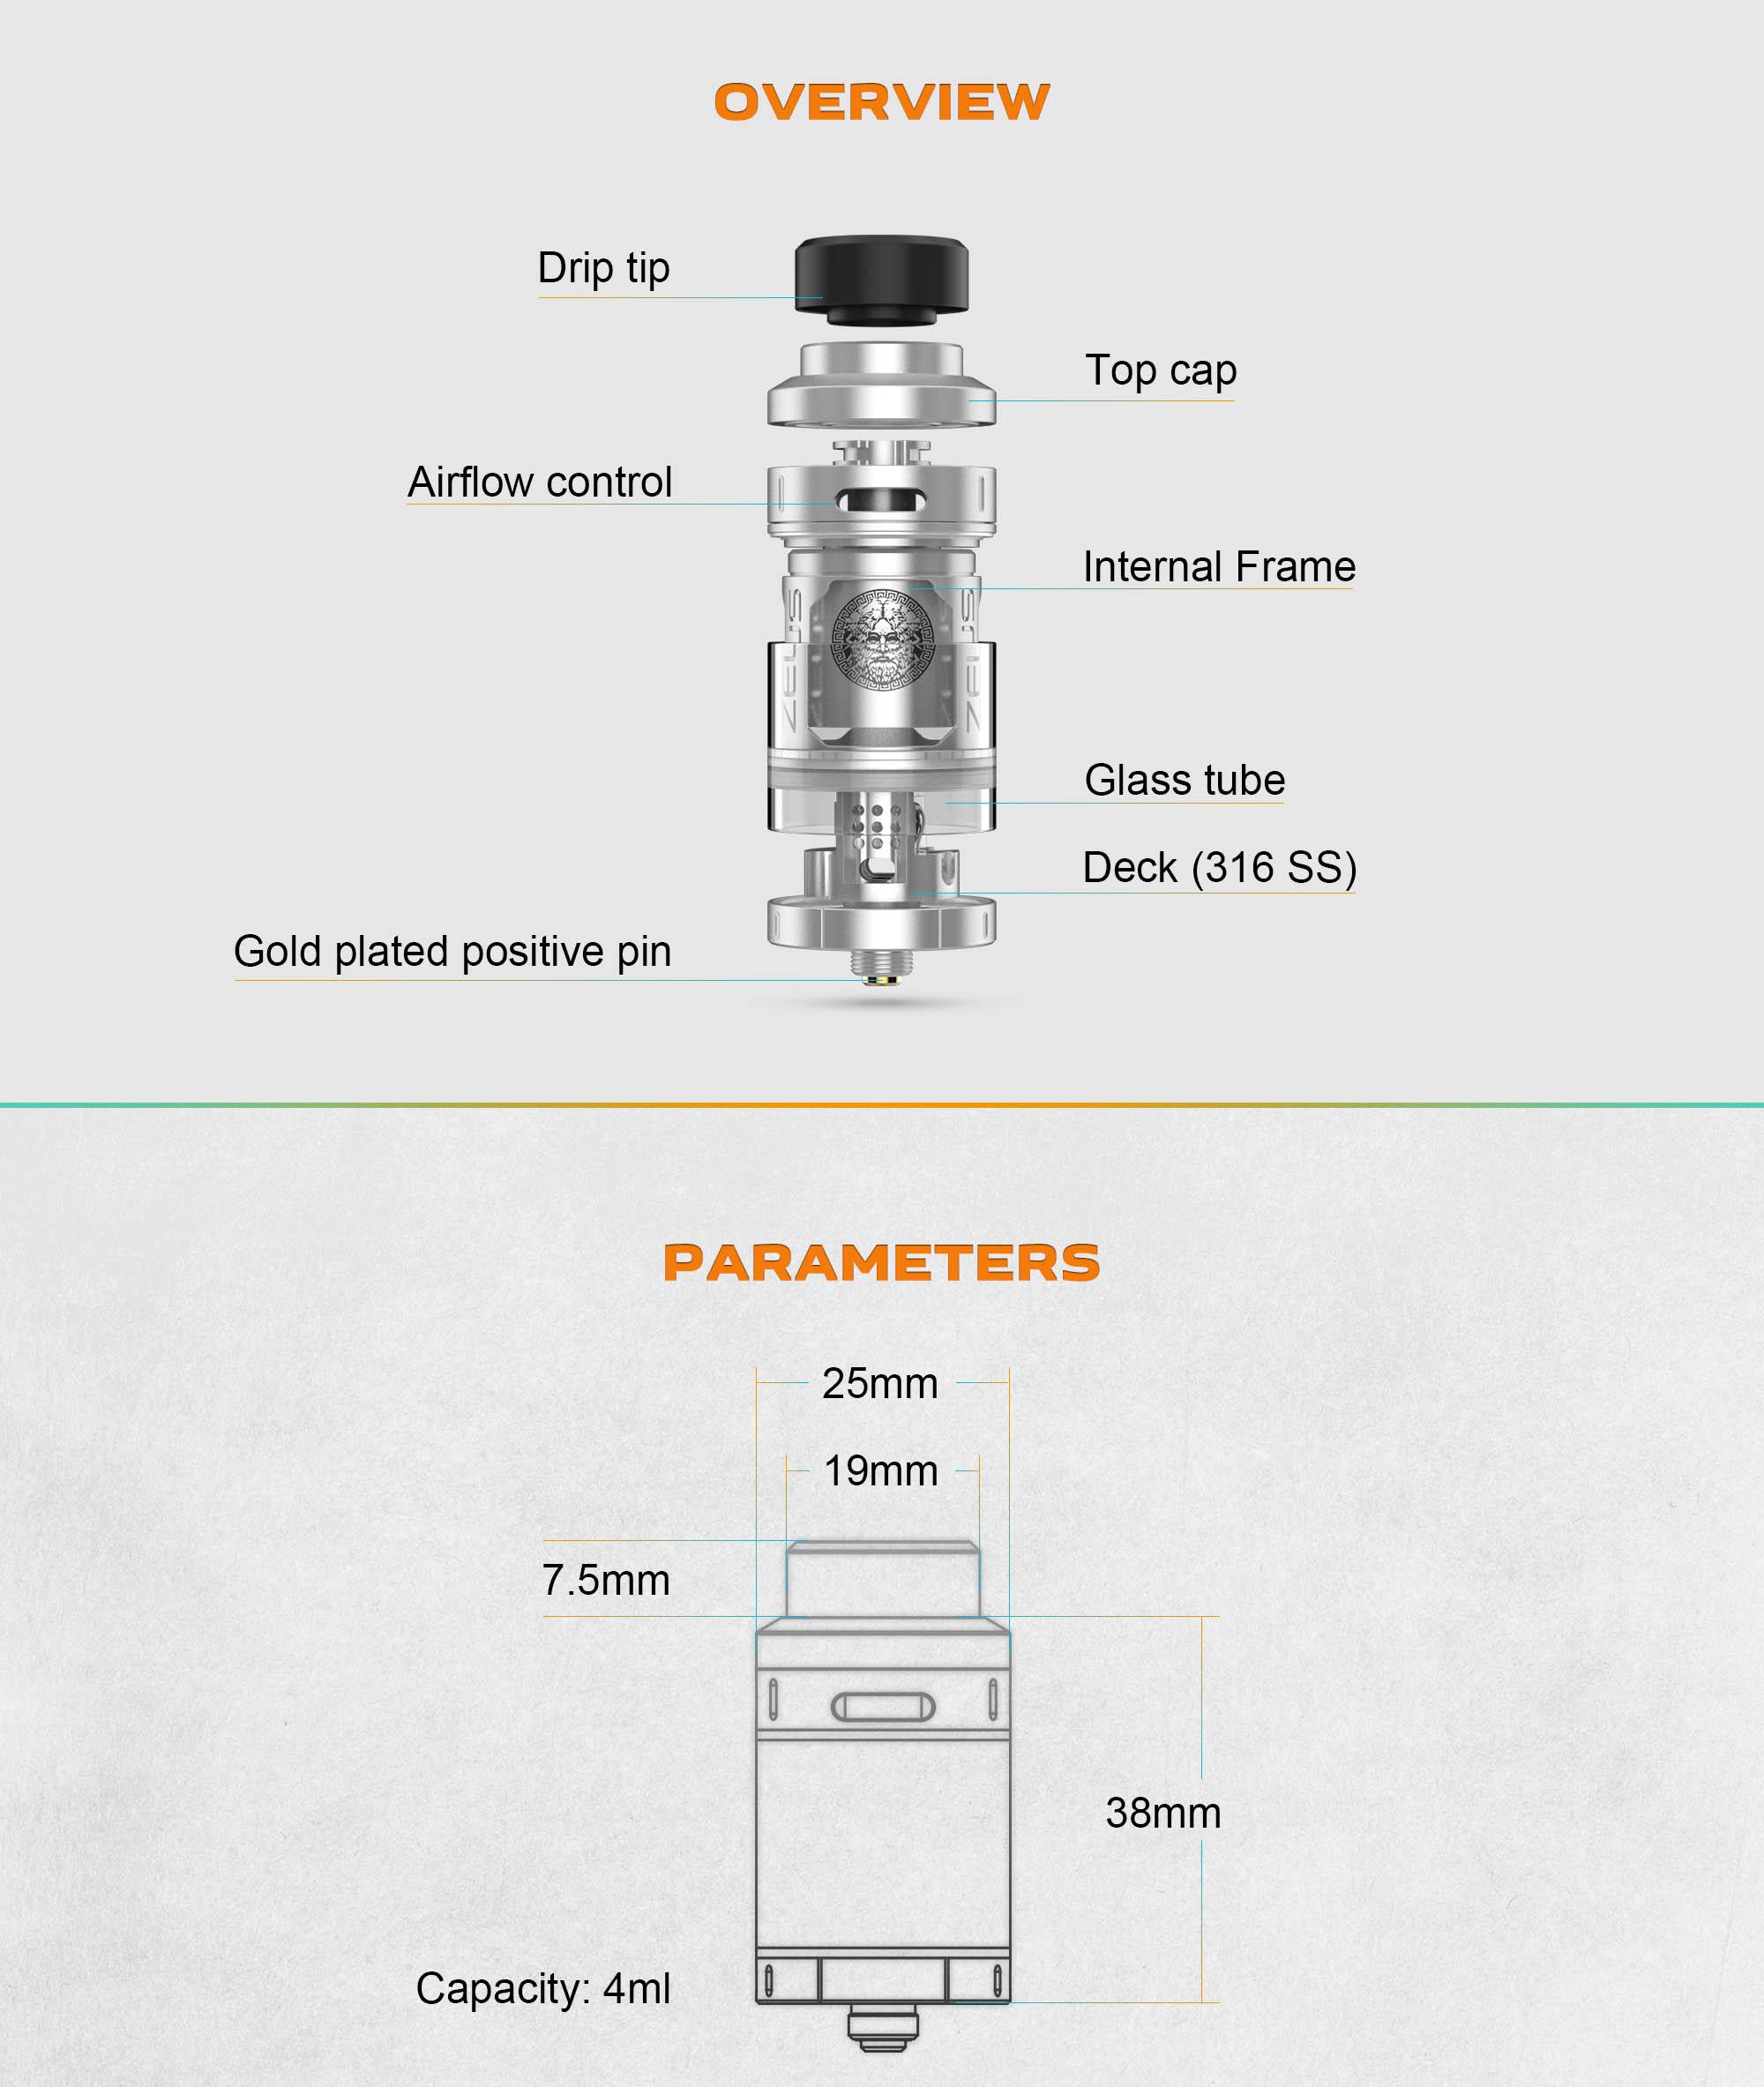 zeus rta geekvape tank top airflow vapexperts 1